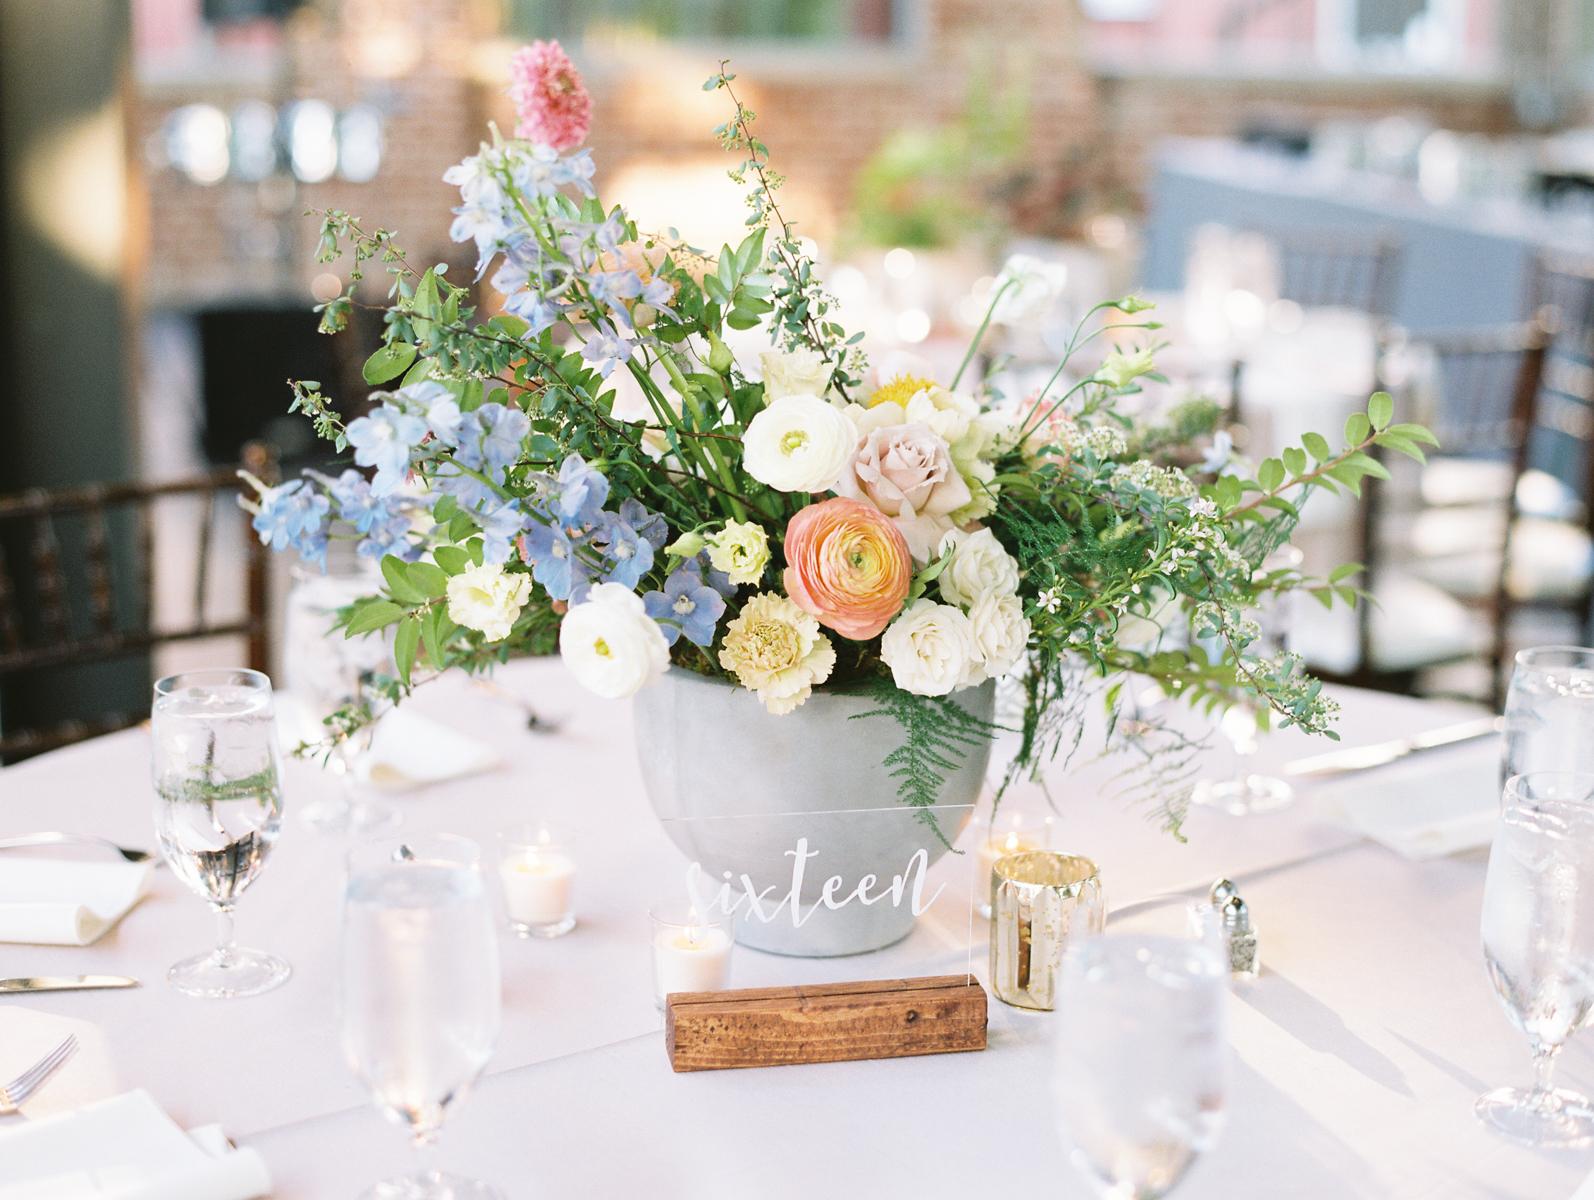 Foundry-At-Puritan-Mill-wedding-photos-venue-atlanta-fine-art-film-photographer55.JPG